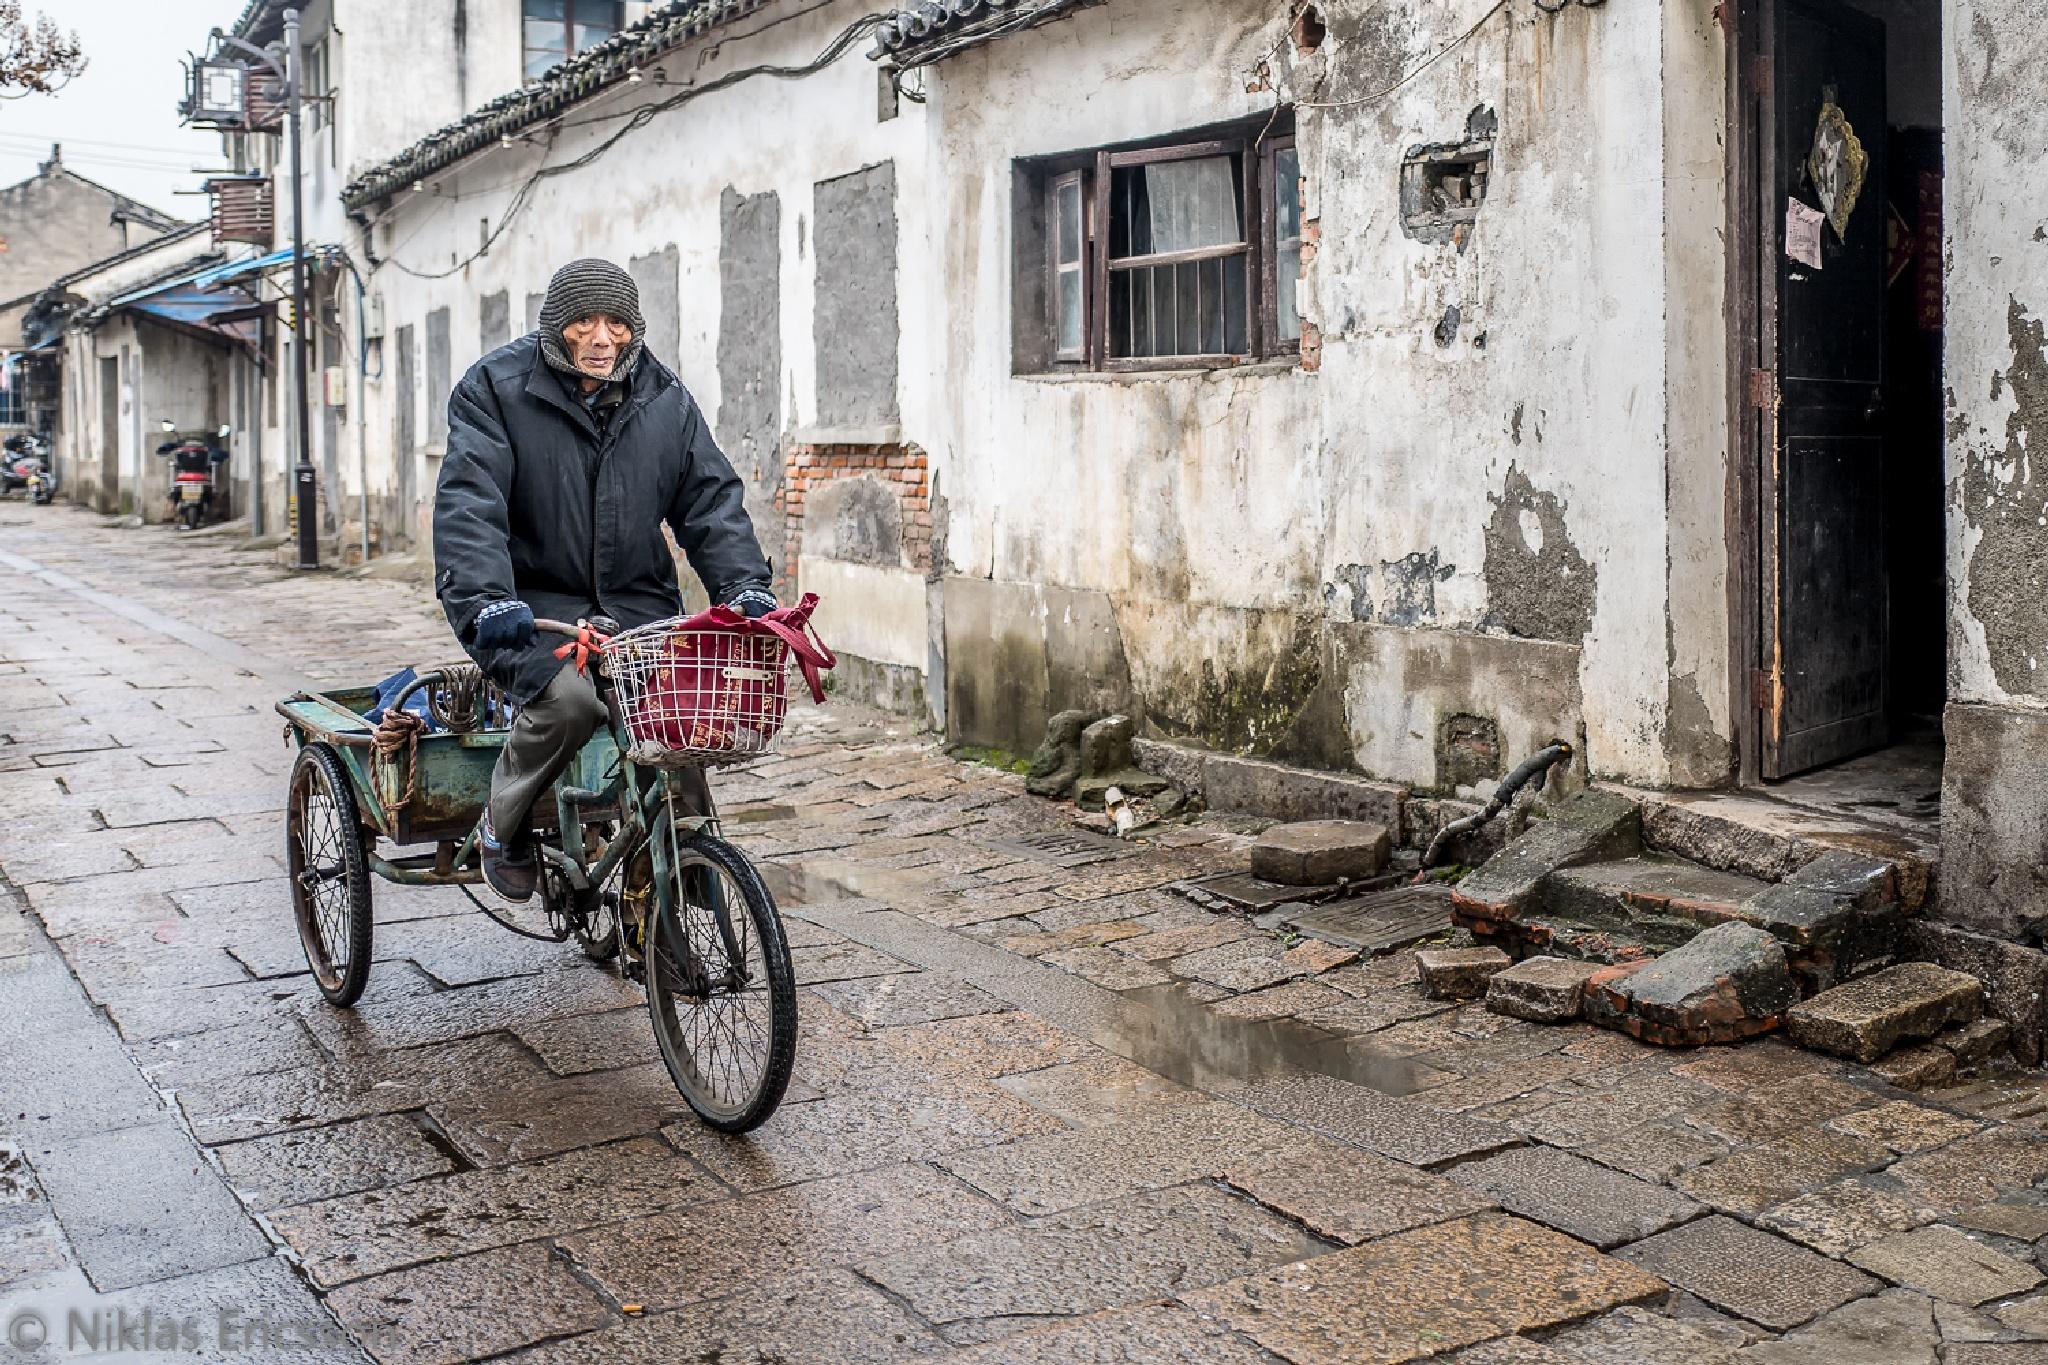 Bike ride by Niklas Ericsson